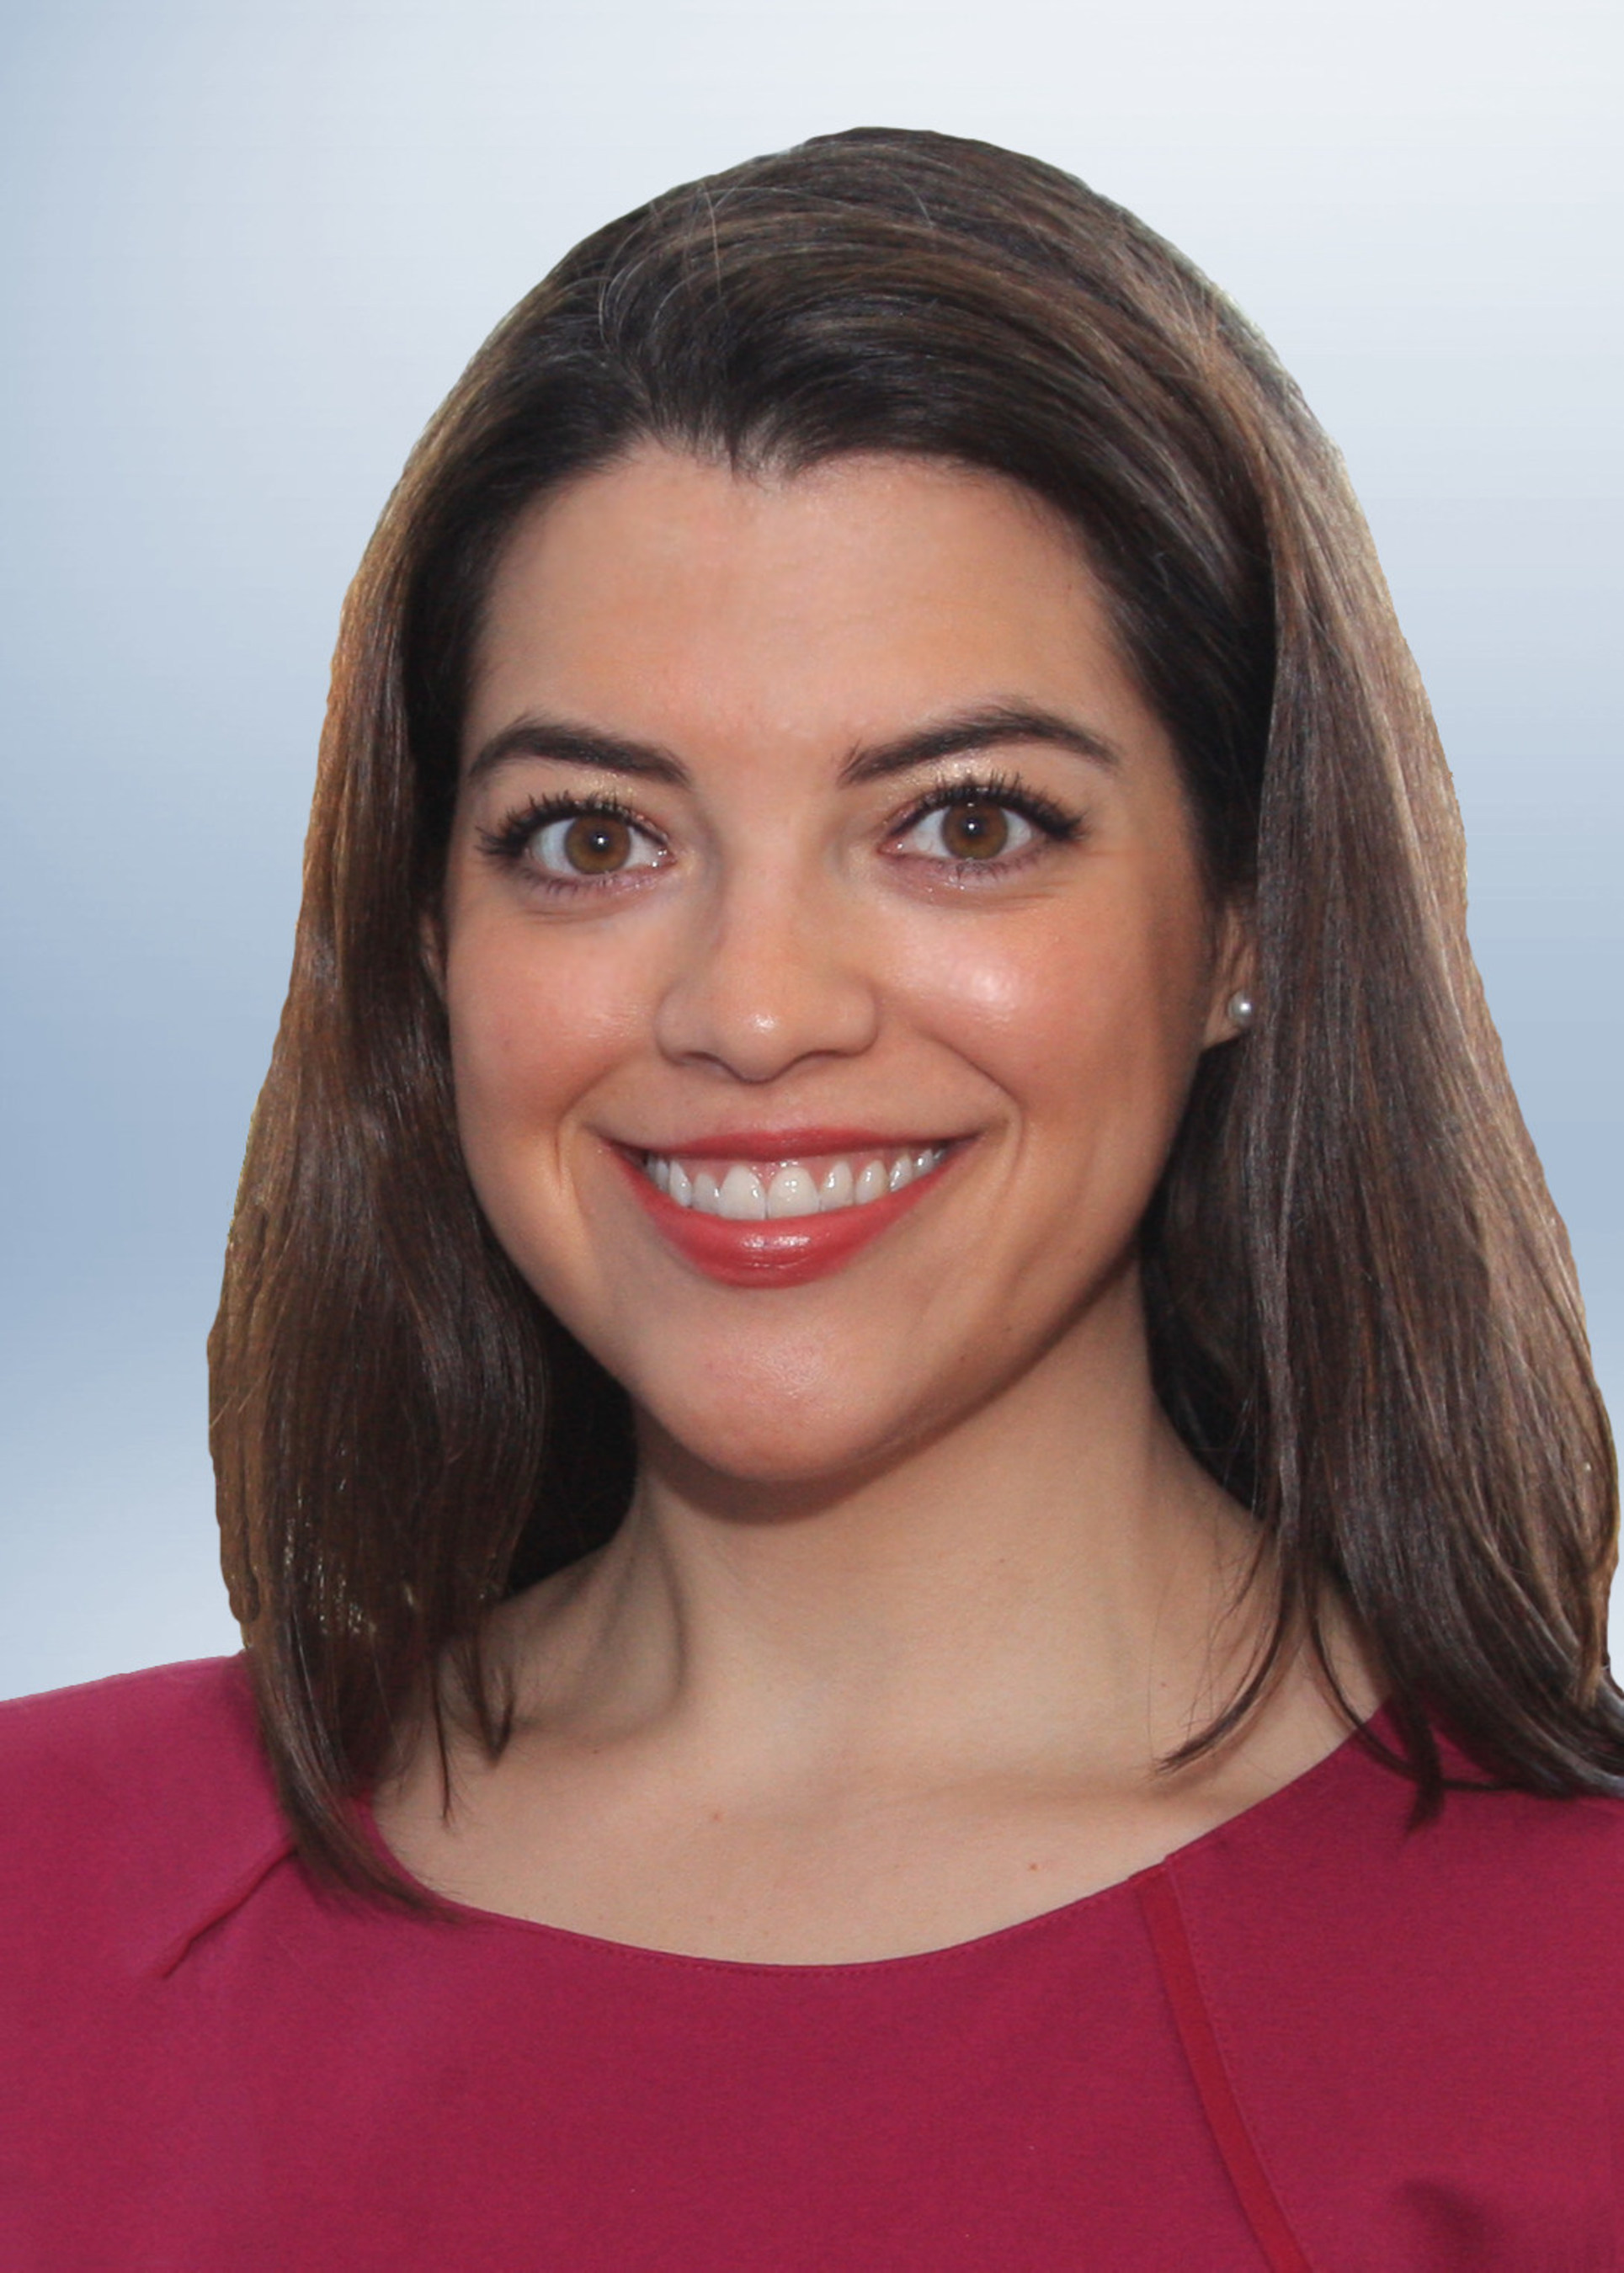 Holly Scimeca, Social Media Strategist and Editor at Androvett Legal Media and Marketing in Dallas and Houston